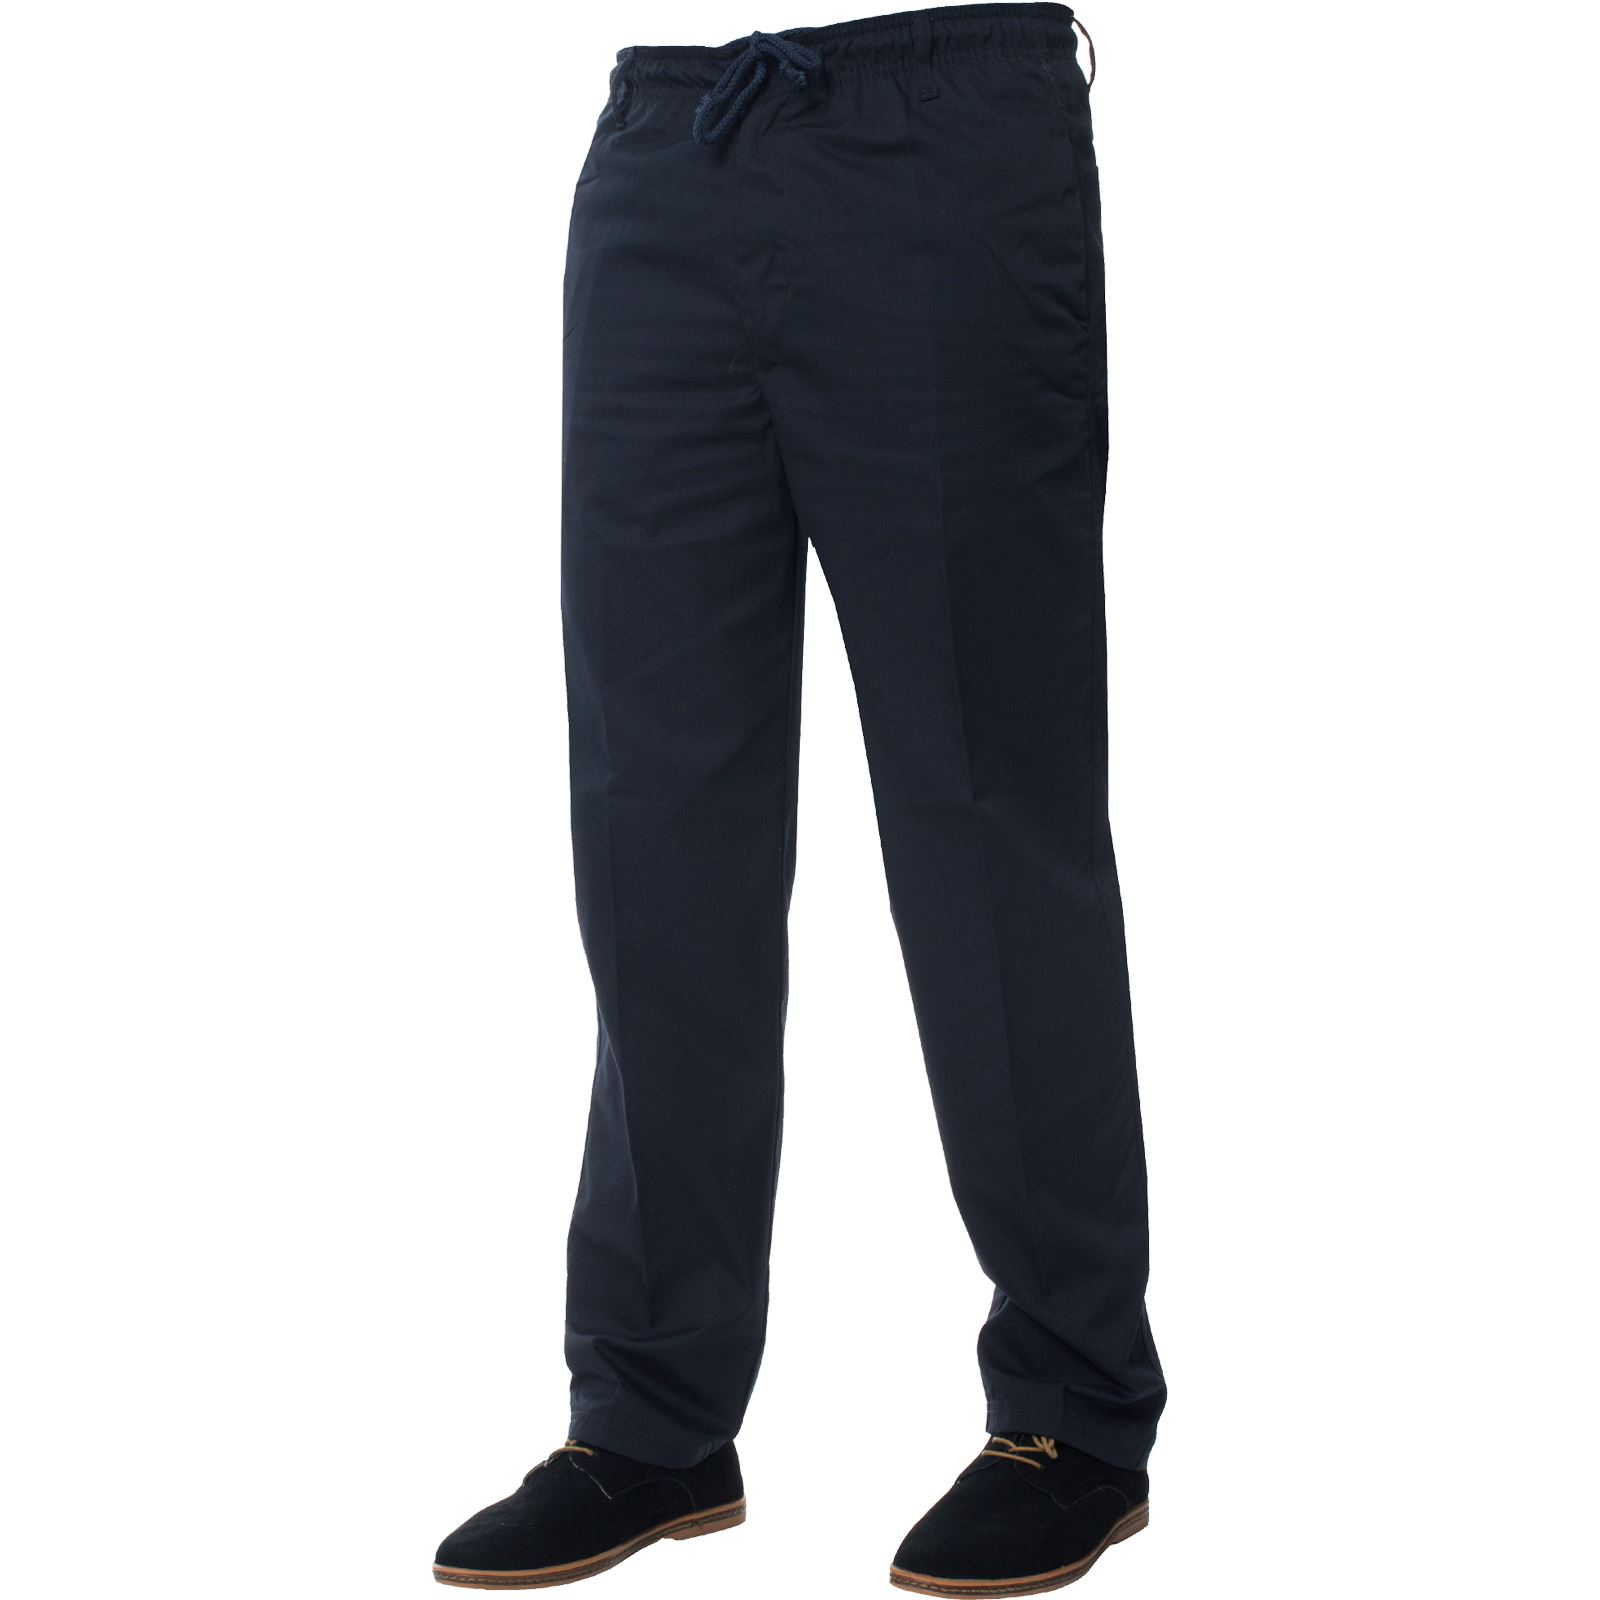 Kruze-Mens-Rugby-Trousers-Elasticated-Waist-Drawstring-Pants-Regular-King-Sizes thumbnail 10